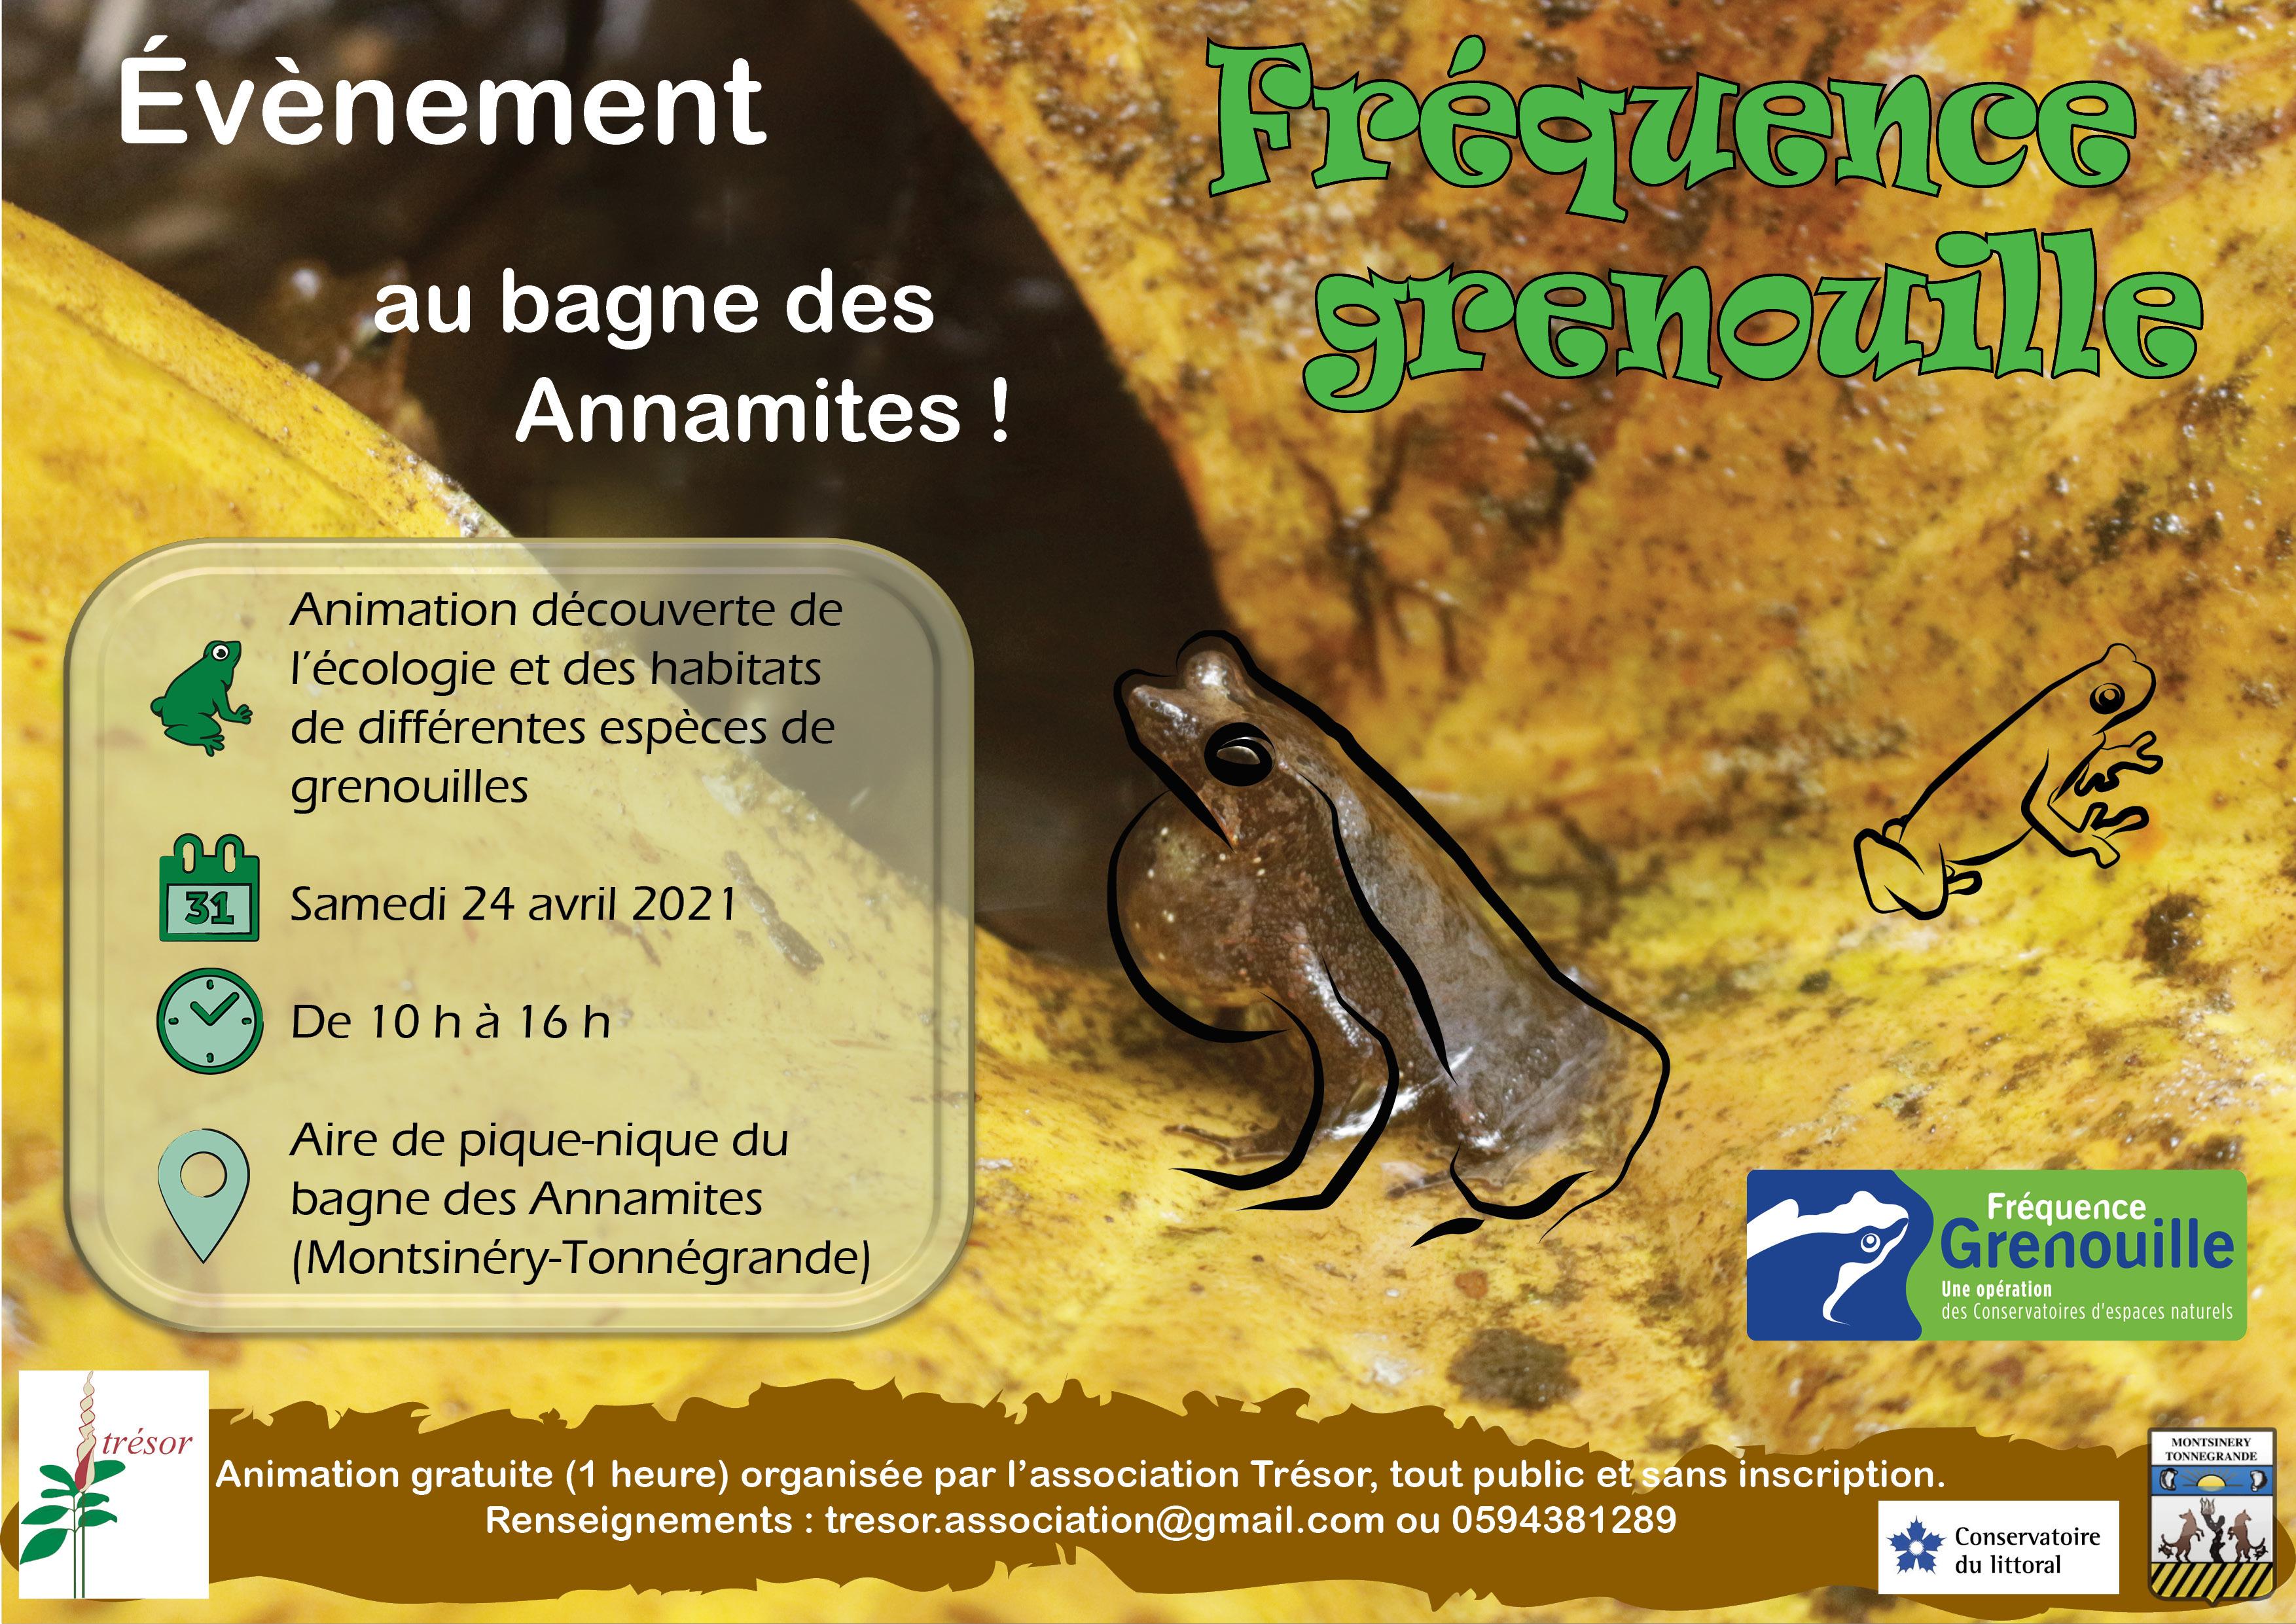 https://cdnfiles1.biolovision.net/www.faune-guyane.fr/userfiles/Documentsdivers/Amphibiens/FrquencegrenouilleAnnamites240421.jpg